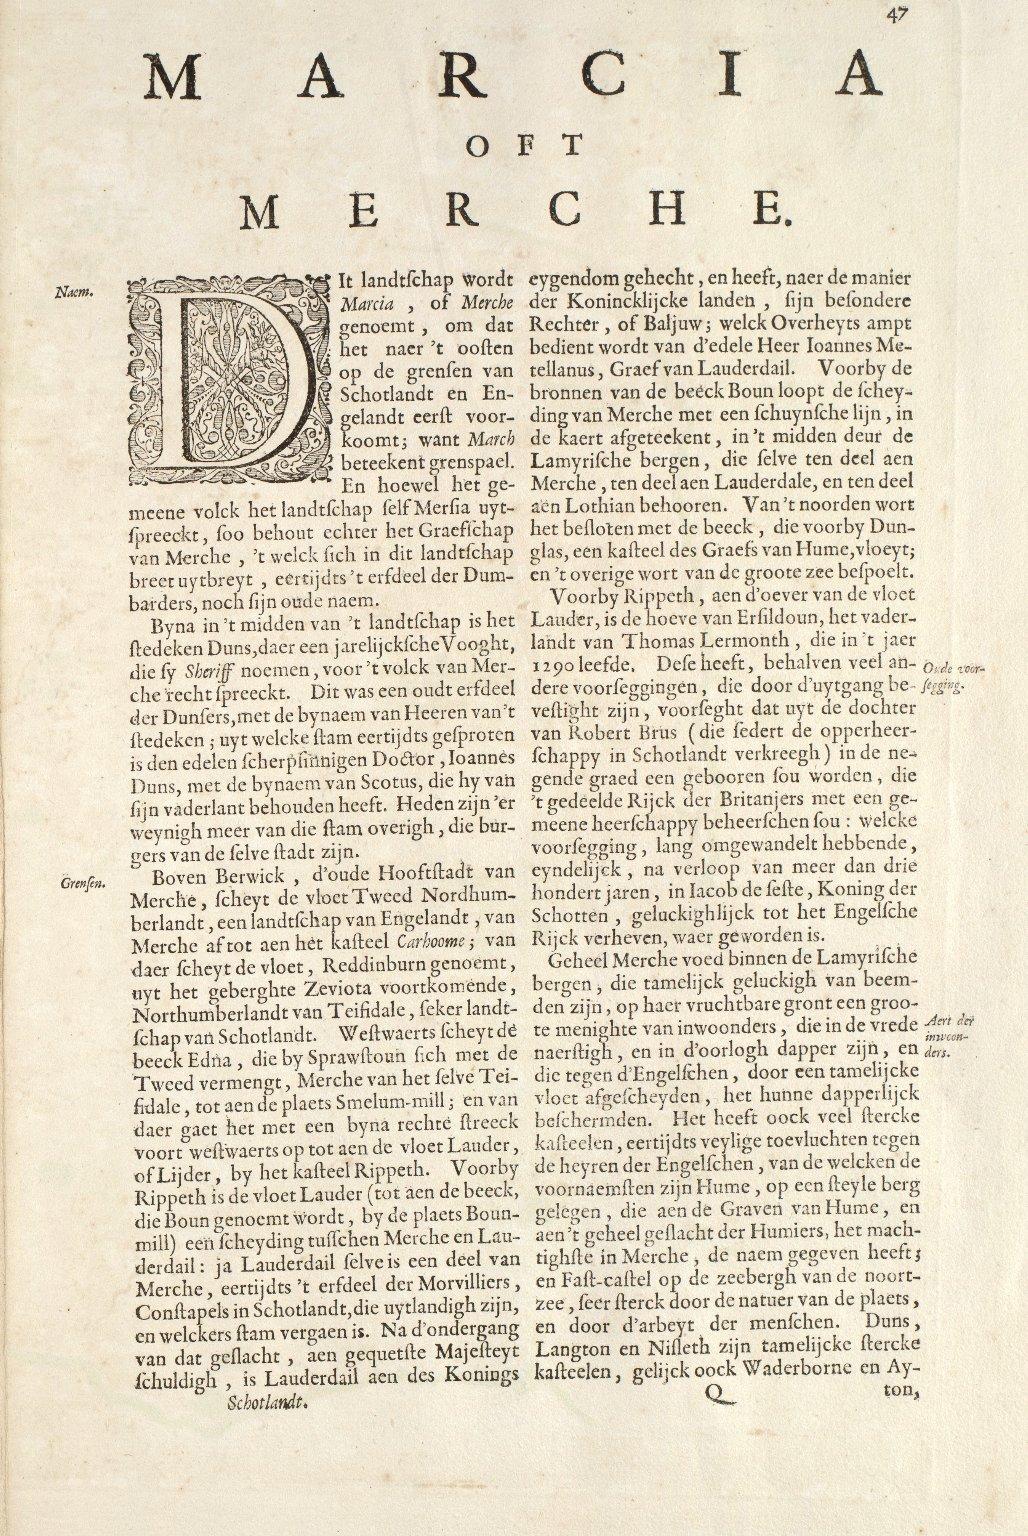 [Geographiae Blavianae] [Also known as: Atlas major] [037 of 153]